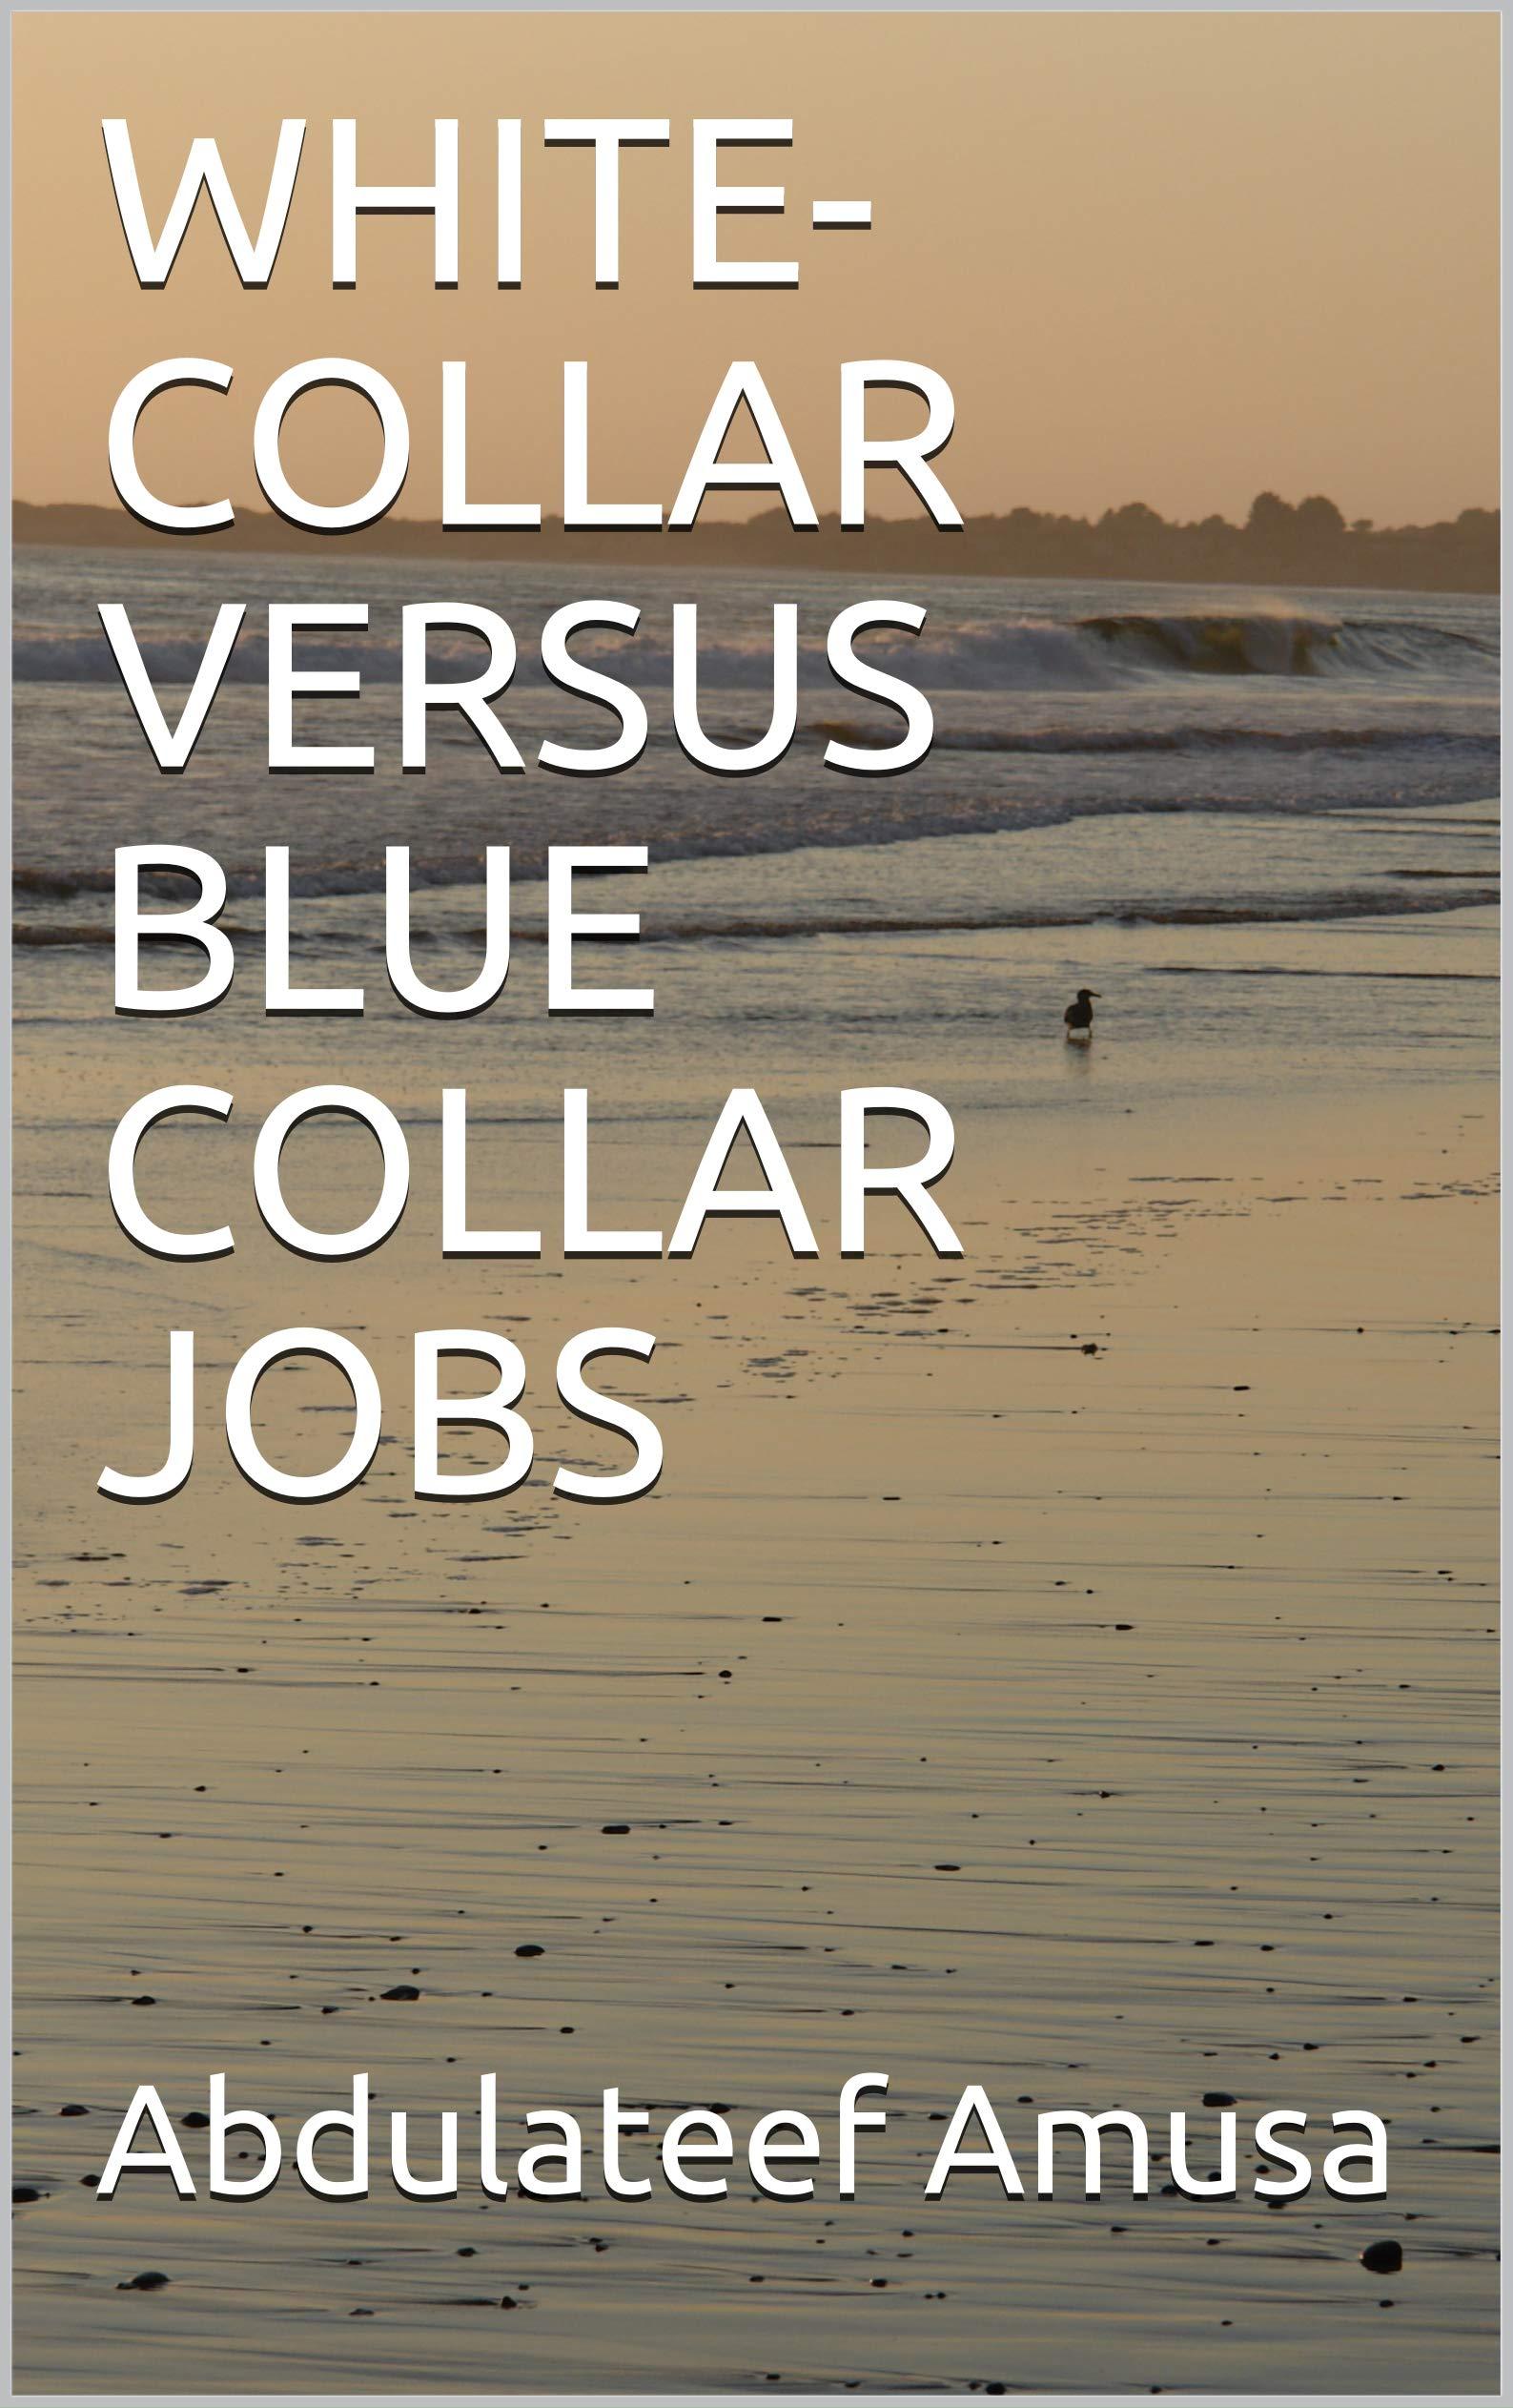 WHITE-COLLAR VERSUS BLUE COLLAR JOBS